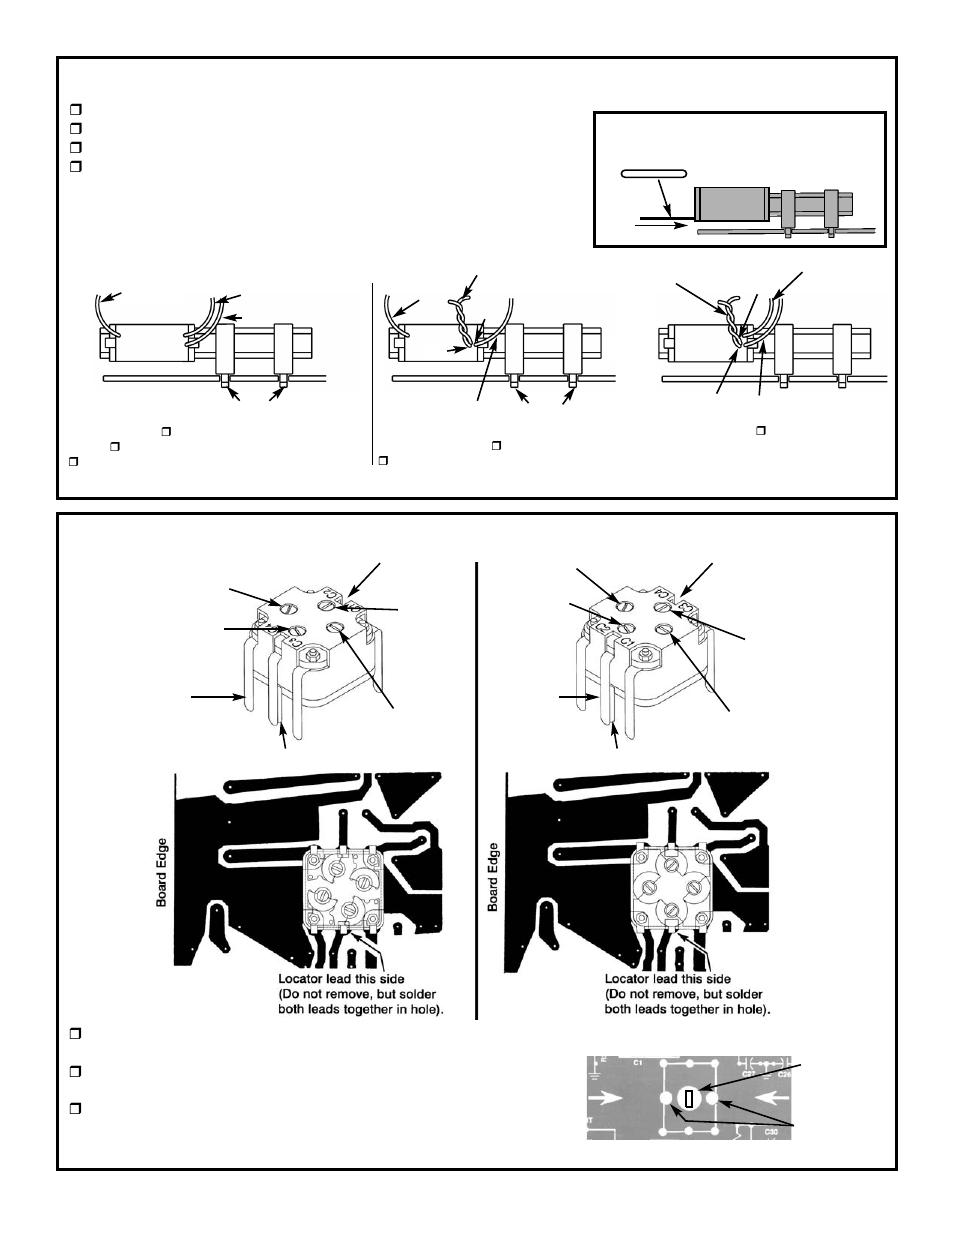 Figure m, Figure n   Elenco AM/FM Radio Kit User Manual   Page 33 / 64